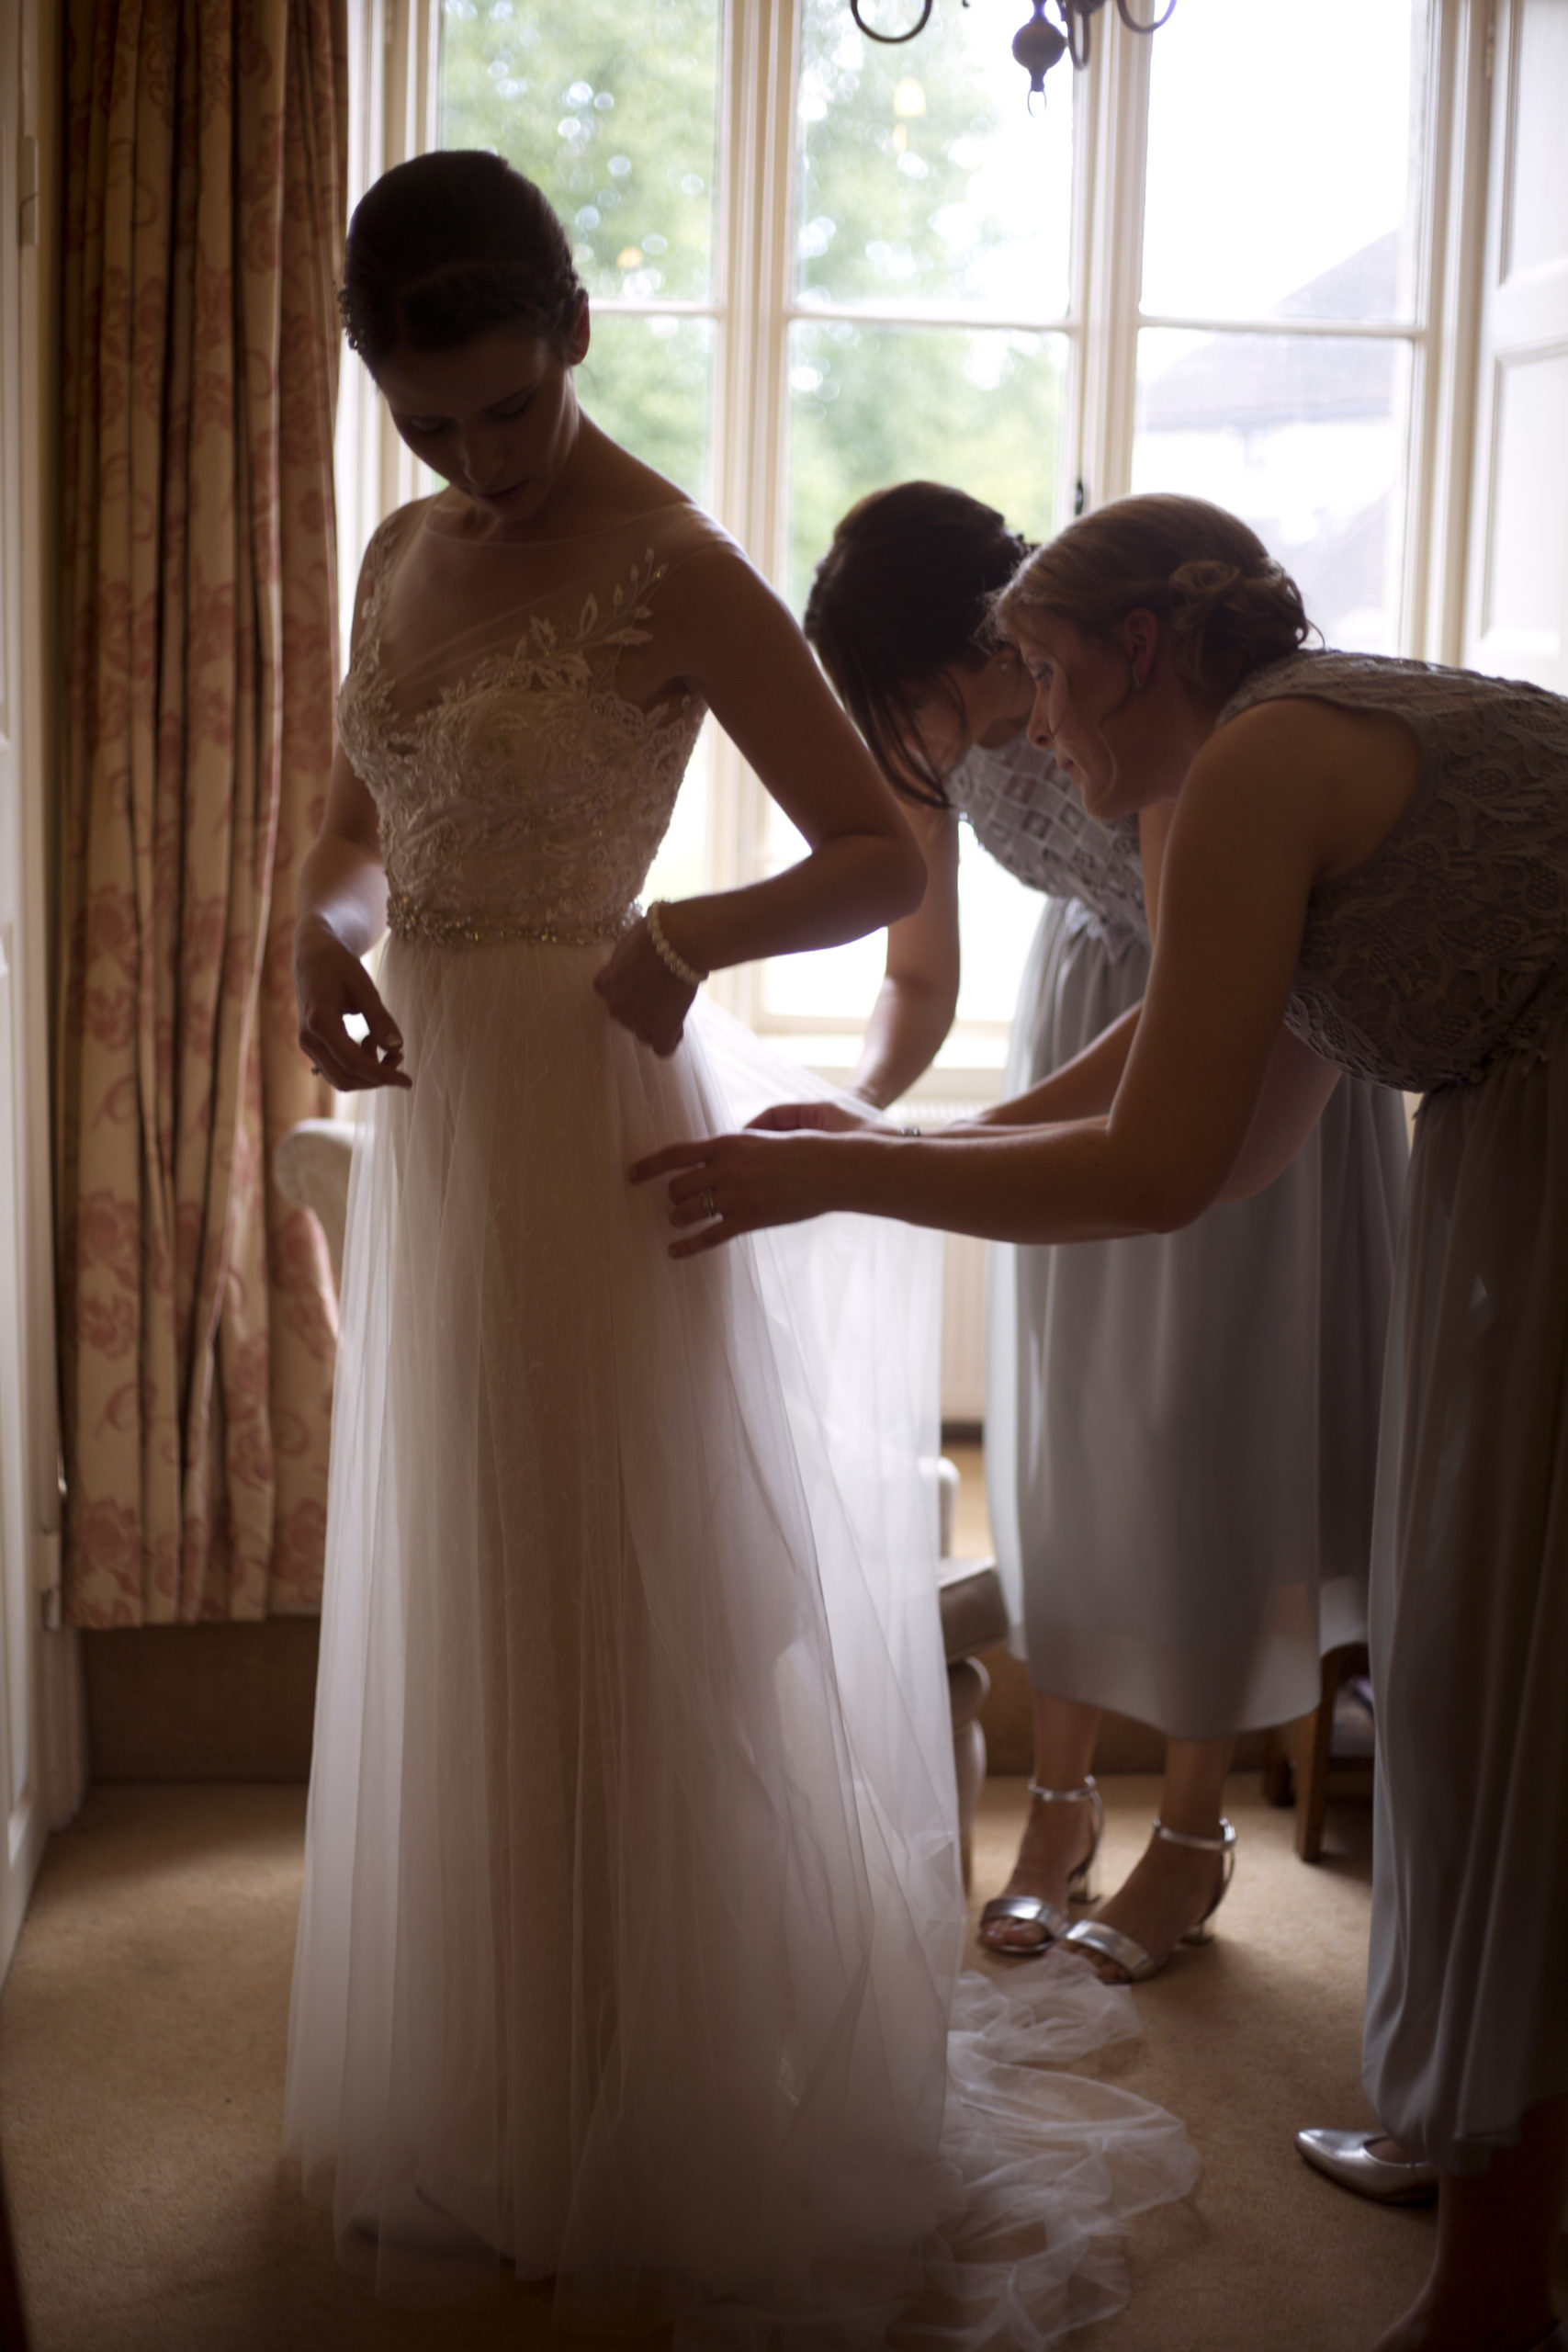 Bridesmaids helping bride into her wedding dress silhouette Cripps barn outdoor wedding photographer